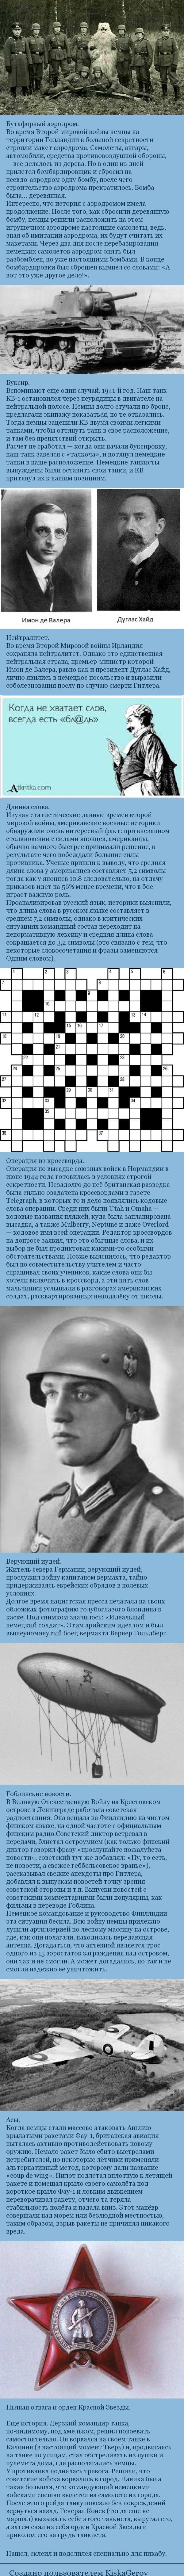 historyVOV